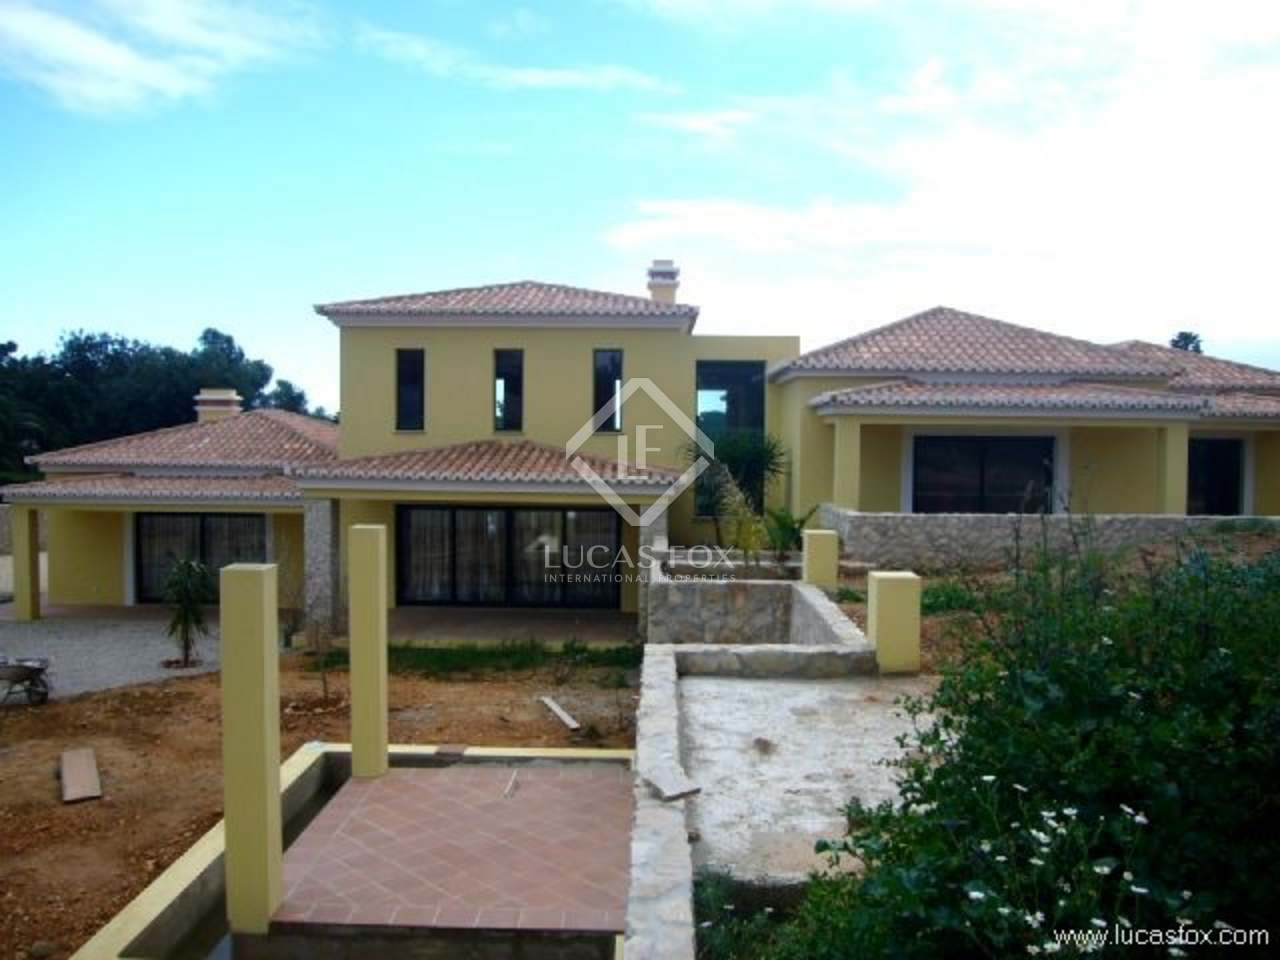 472m haus villa zum verkauf in algarve portugal. Black Bedroom Furniture Sets. Home Design Ideas